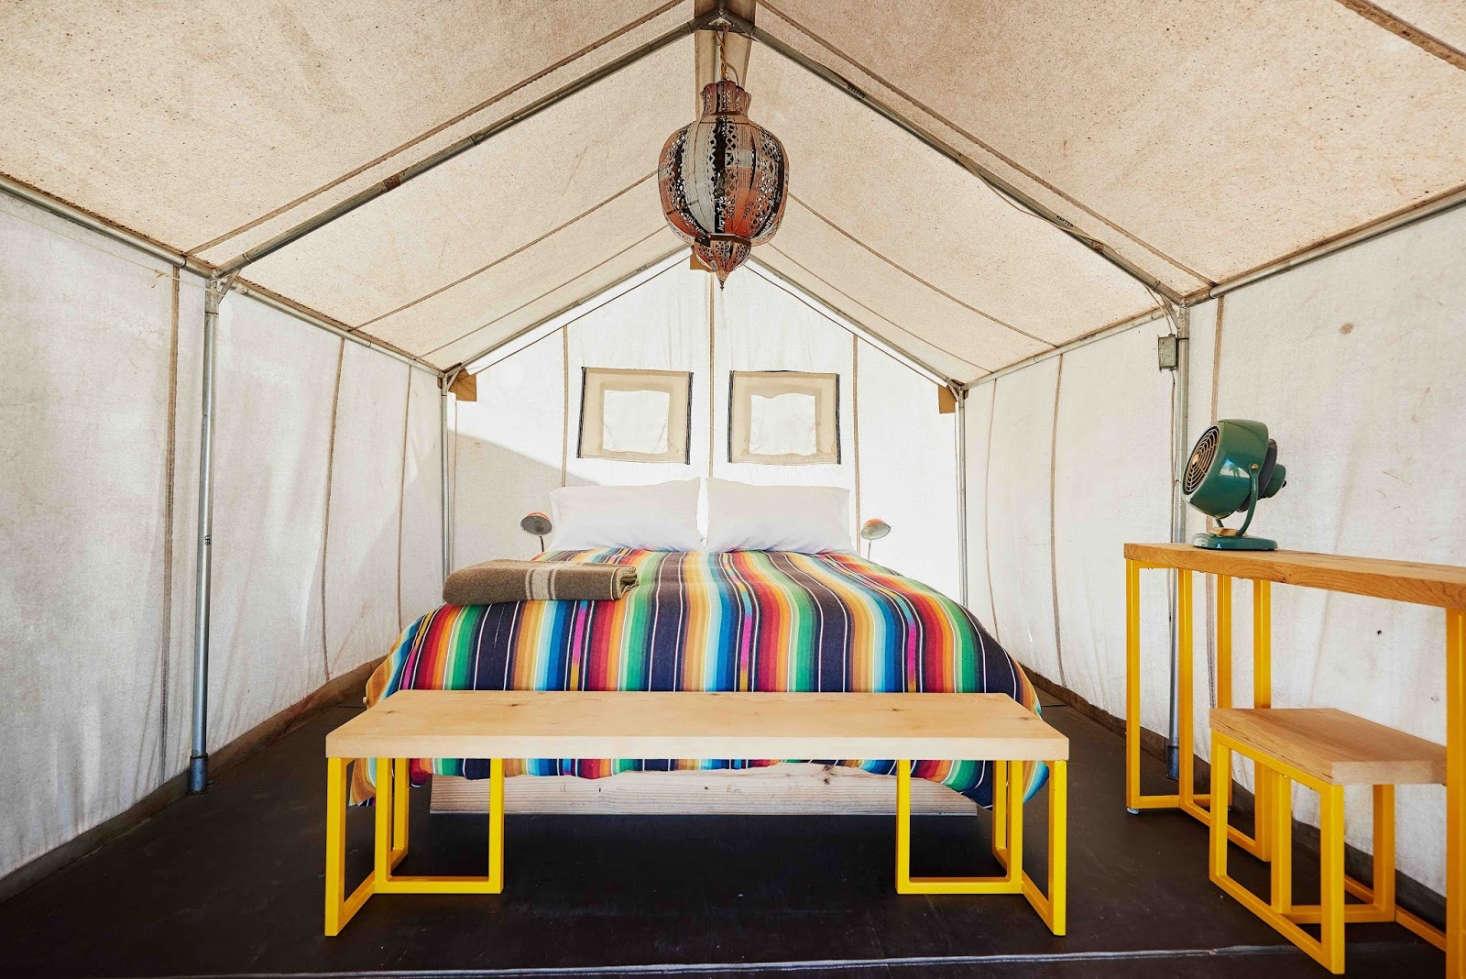 El Cosmico Outdoor Sleeping Tent